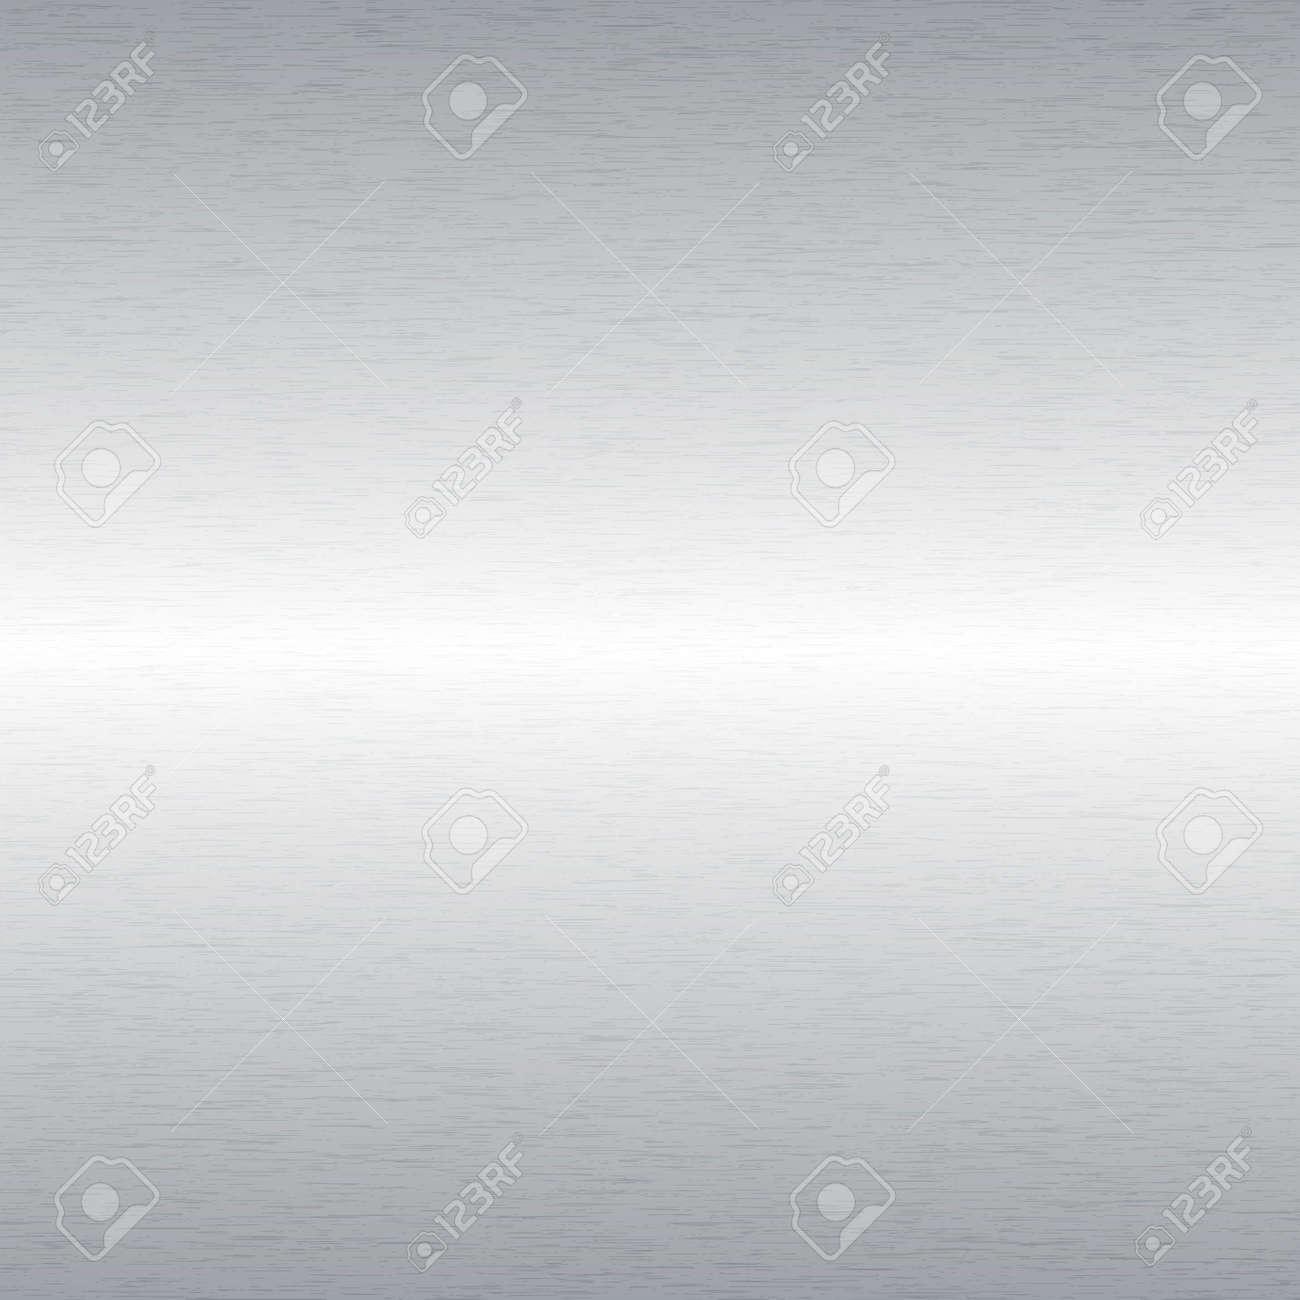 Aluminium Brushed Metal Background Stock Vector - 23210494